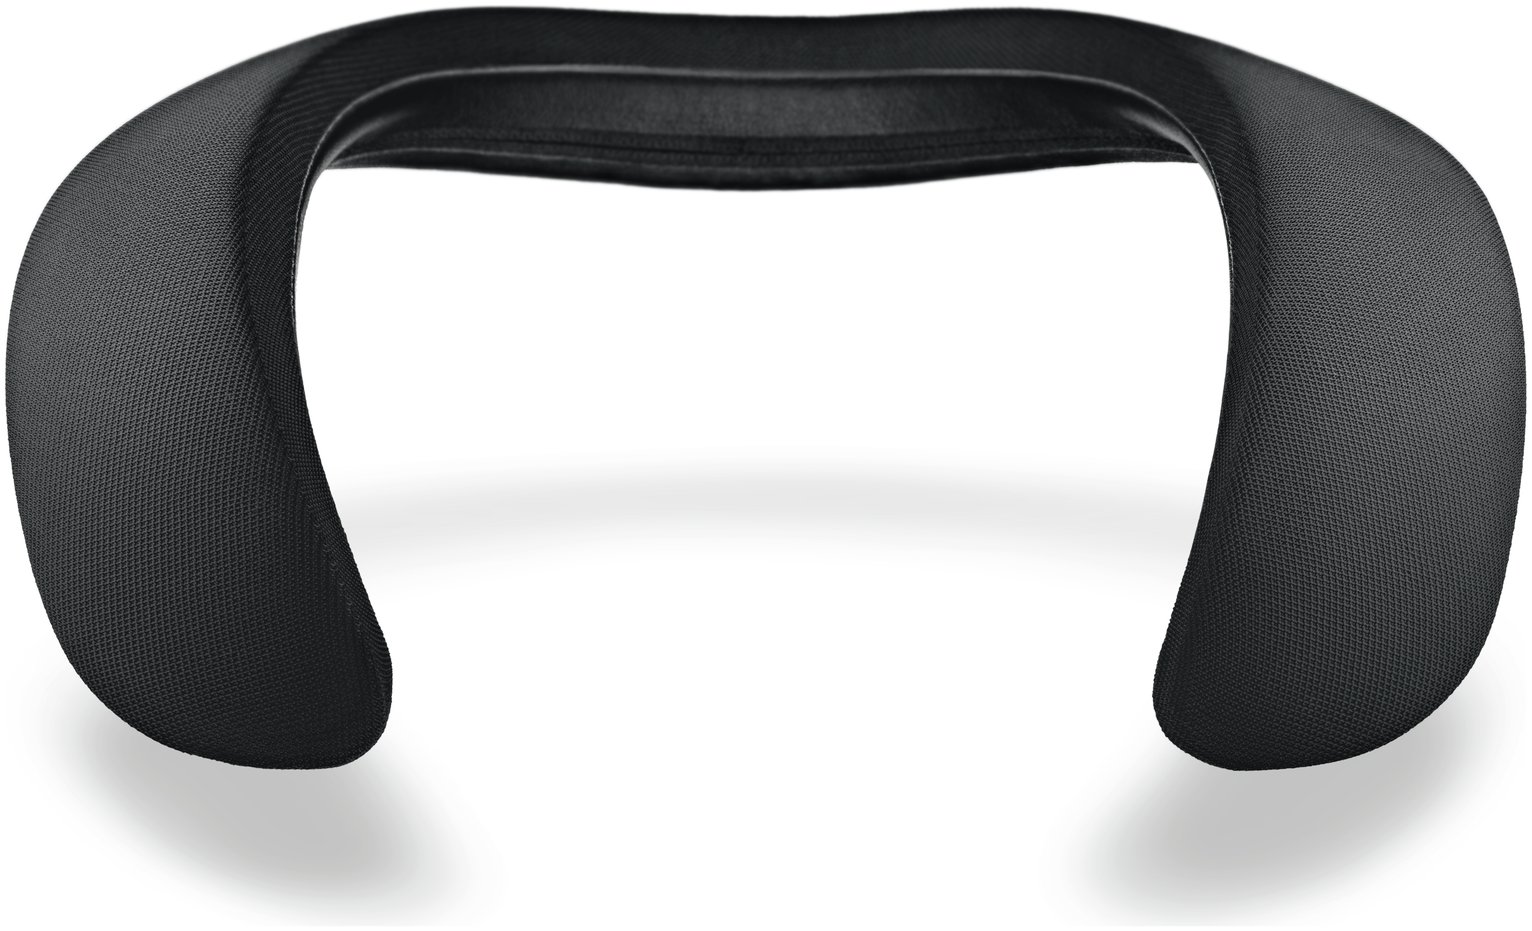 Image of Bose SoundWear Companion Speaker